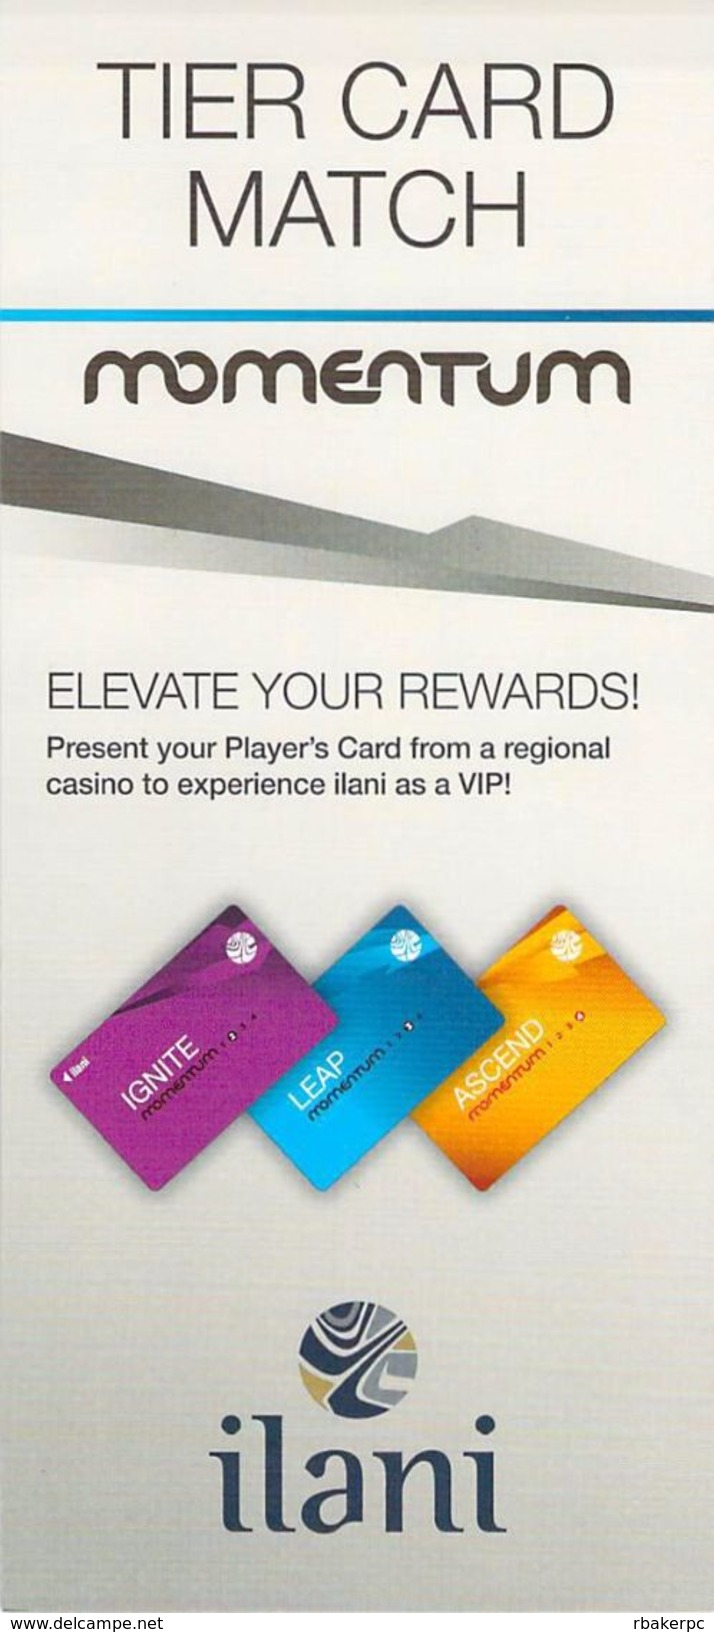 Ilani Casino - Ridgefield, WA - Momentum Tier Card Match Paper Brochure - Advertising